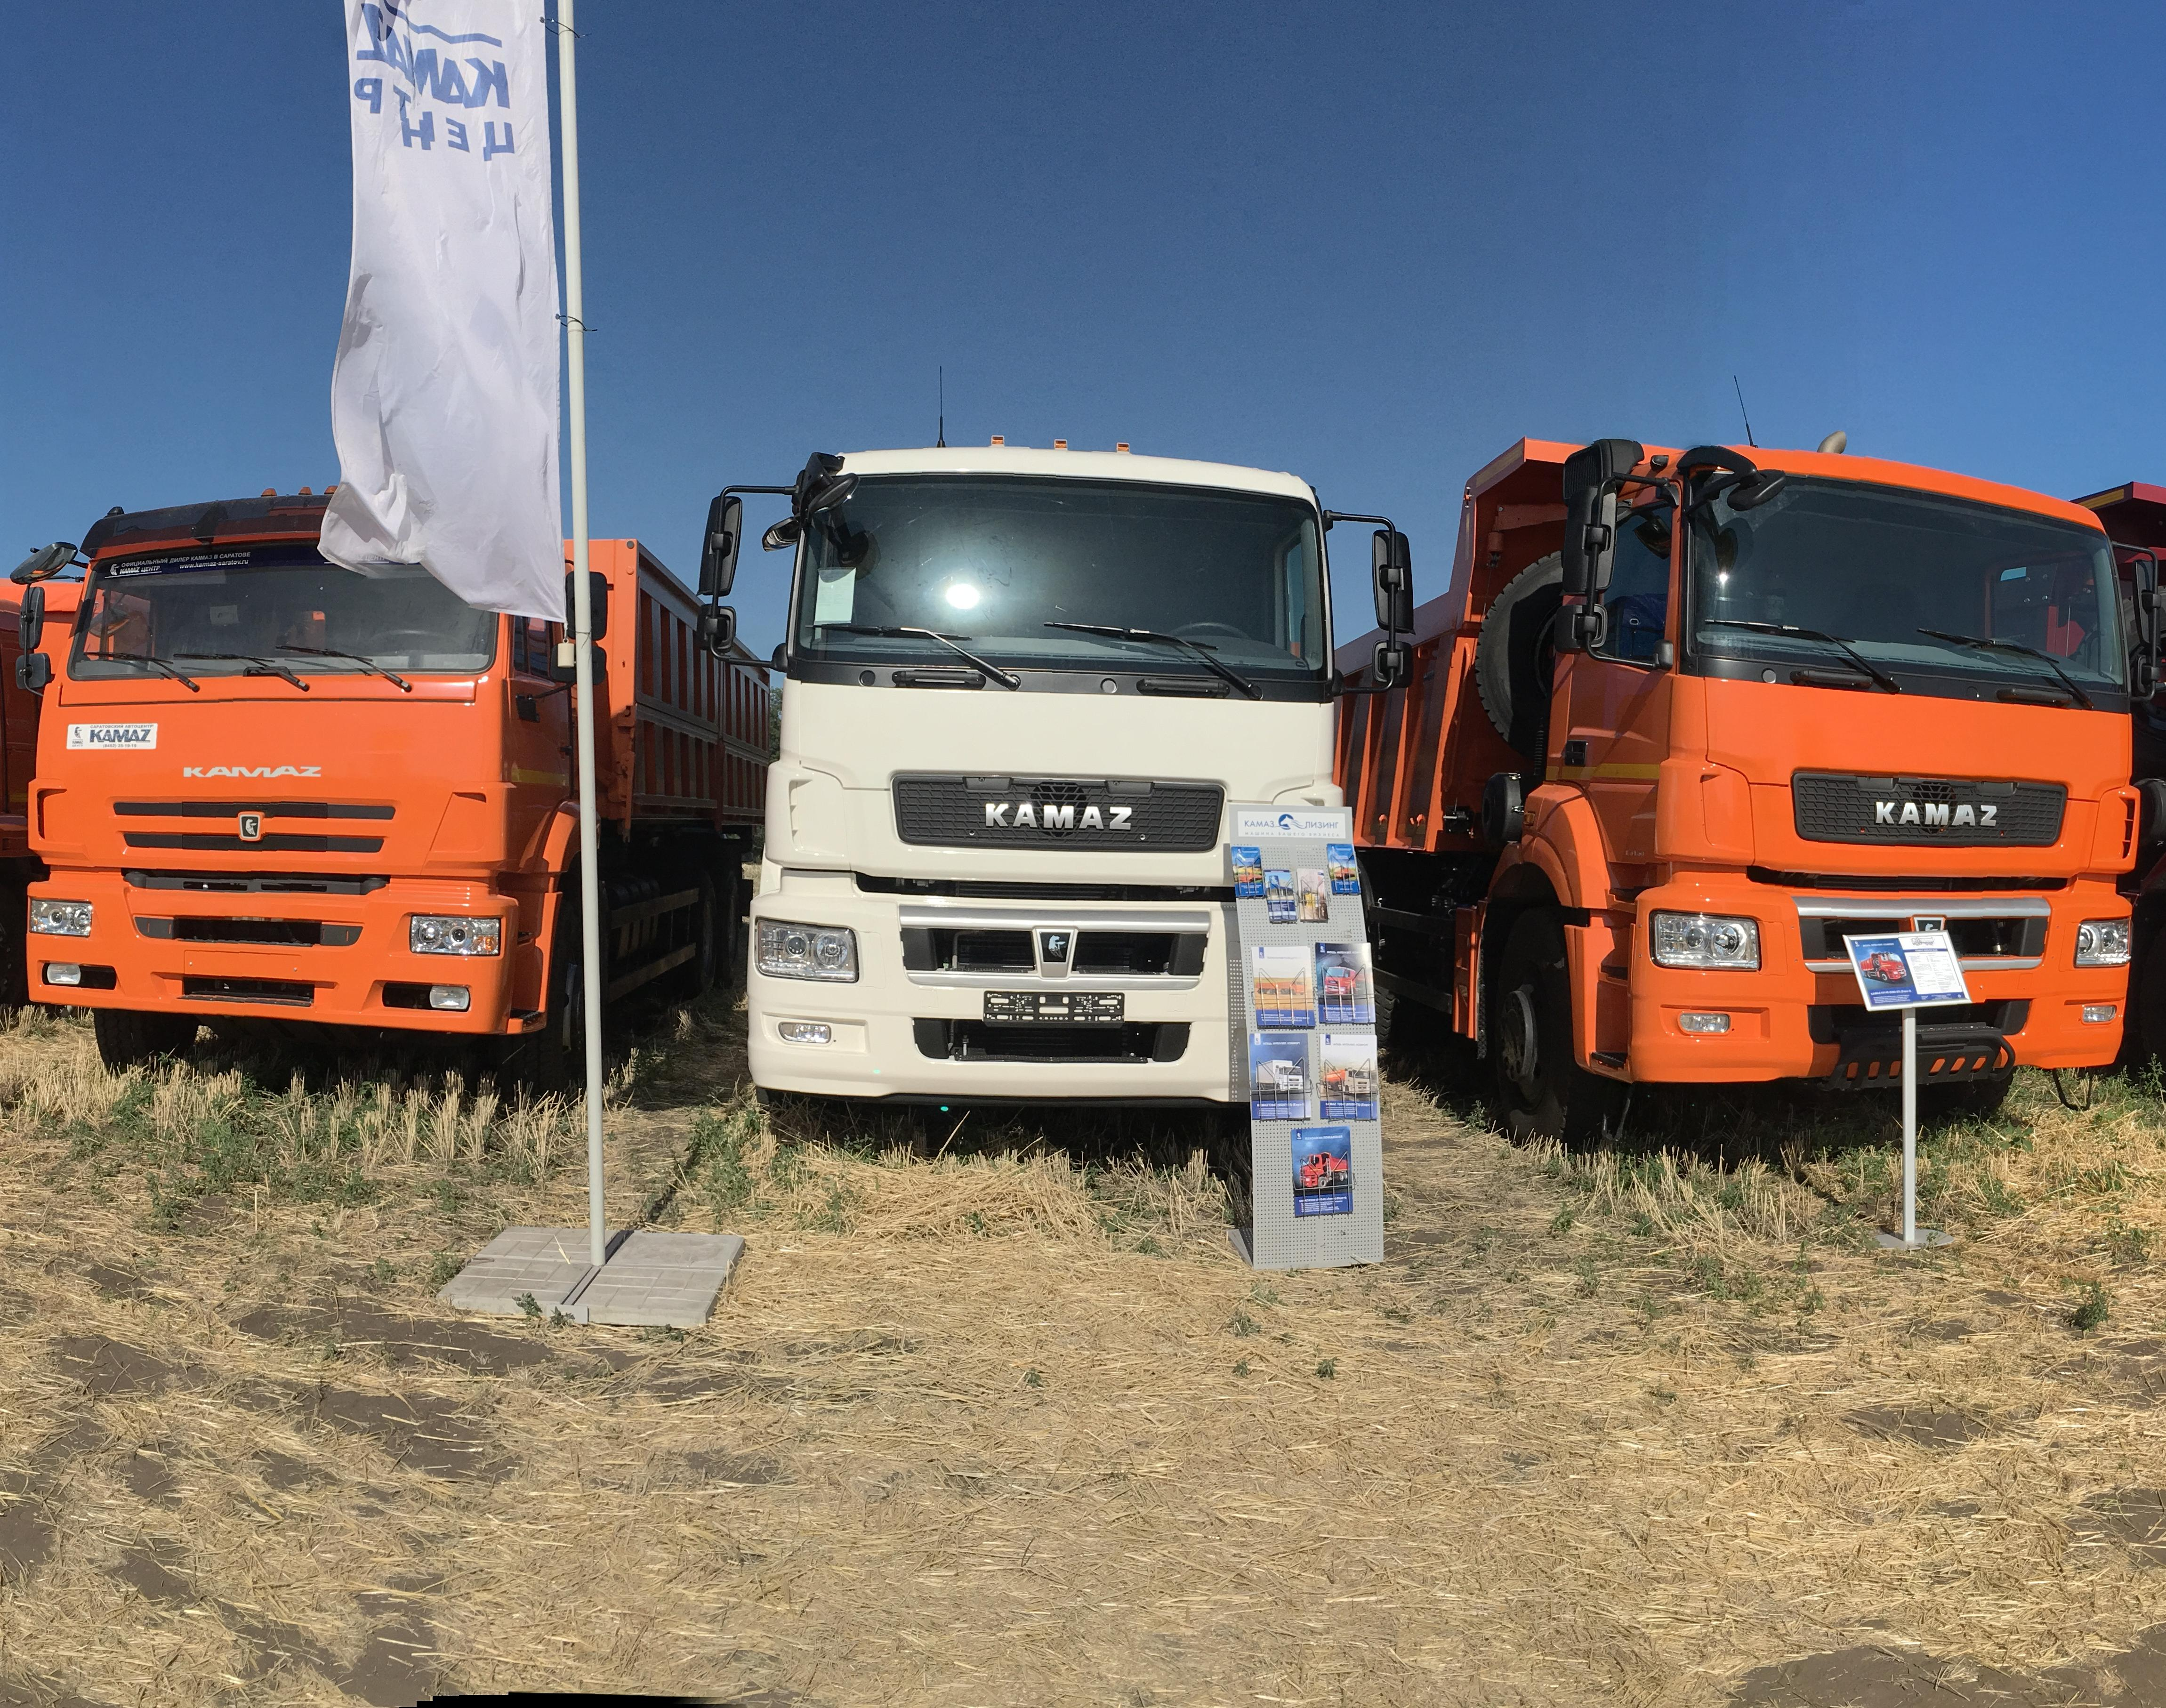 Автомобили КАМАЗ на выставке в Саратове